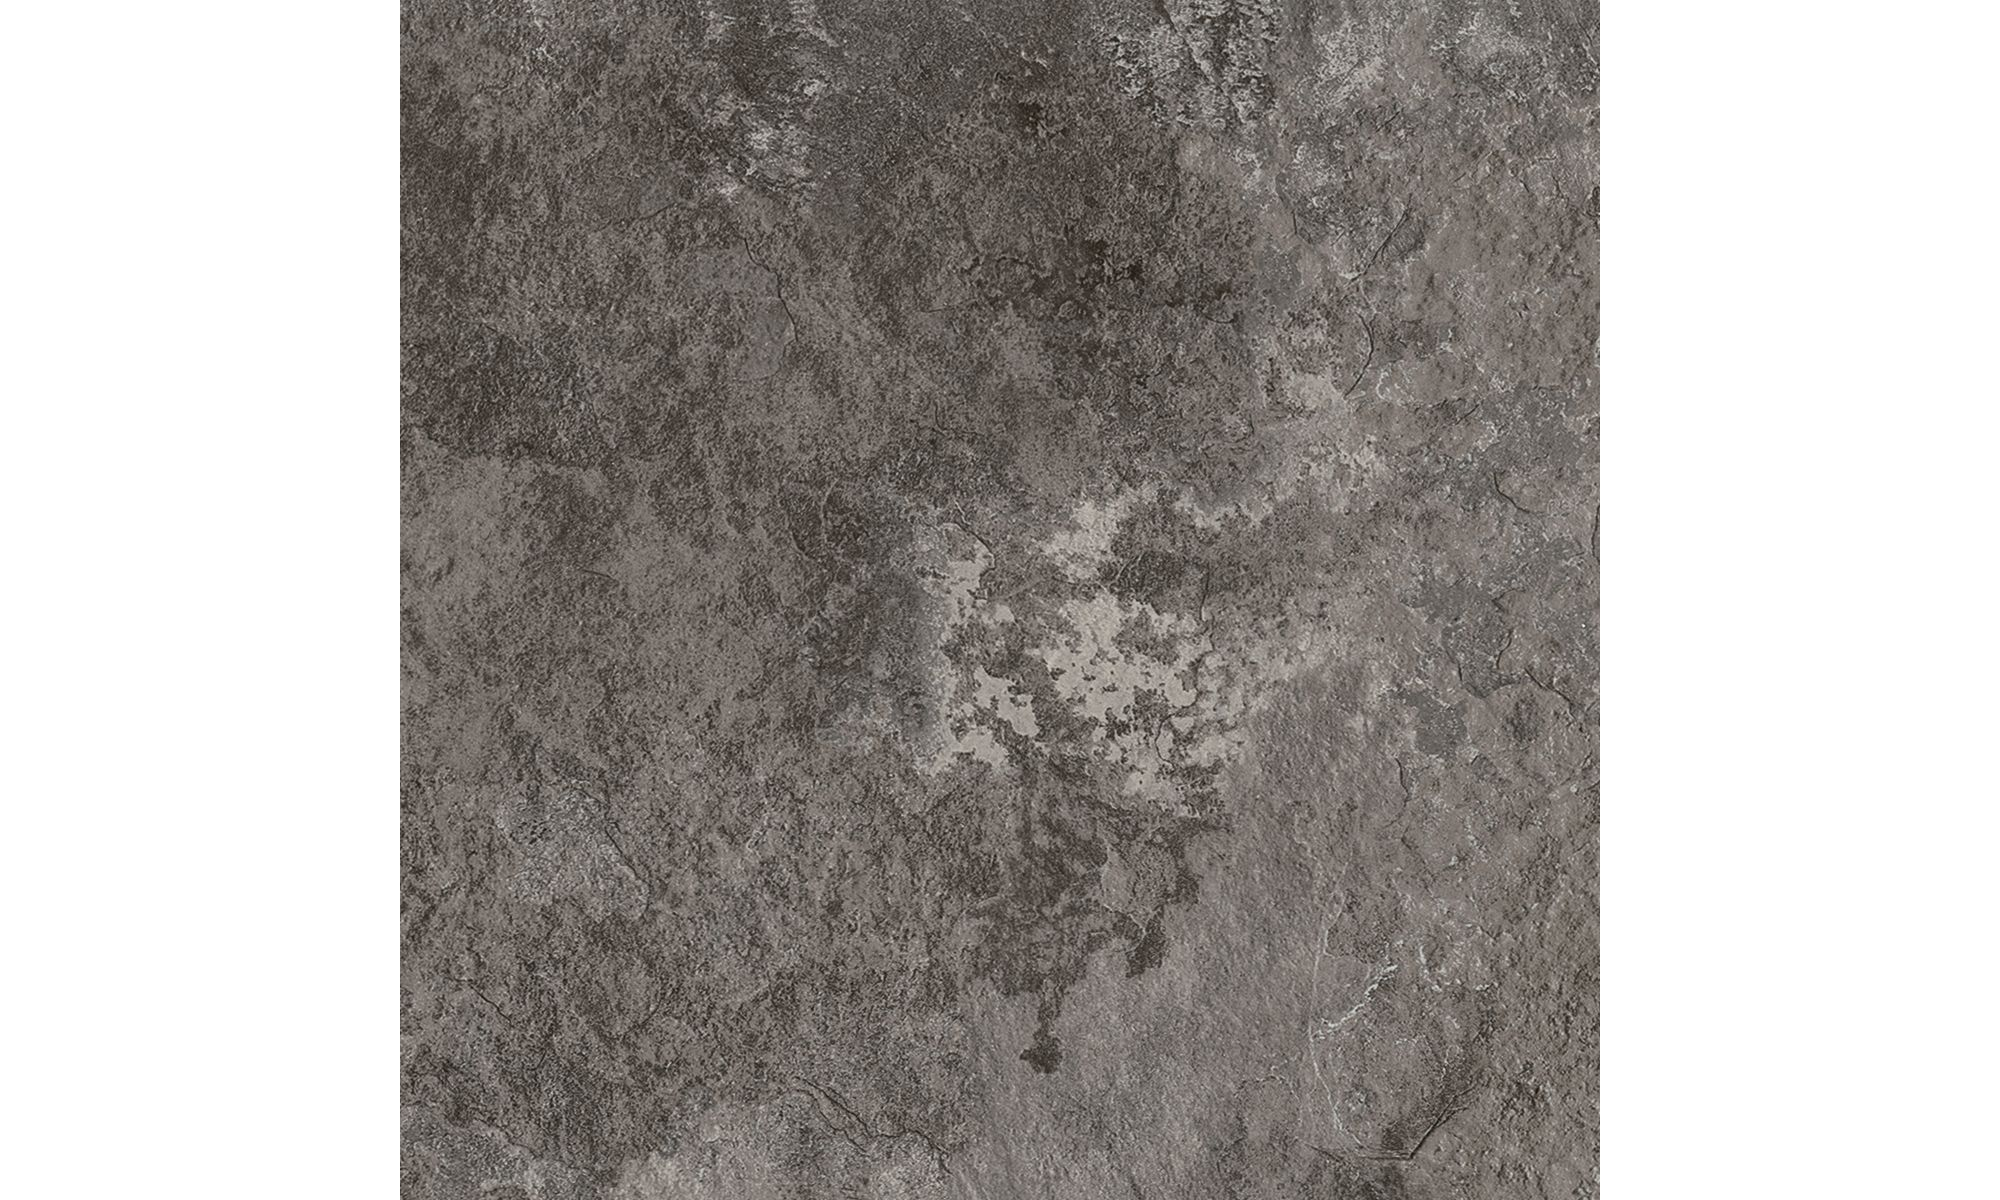 armstrong flooring 12 x 24 vinyl floor tile 30 sf pack storm cloud gray